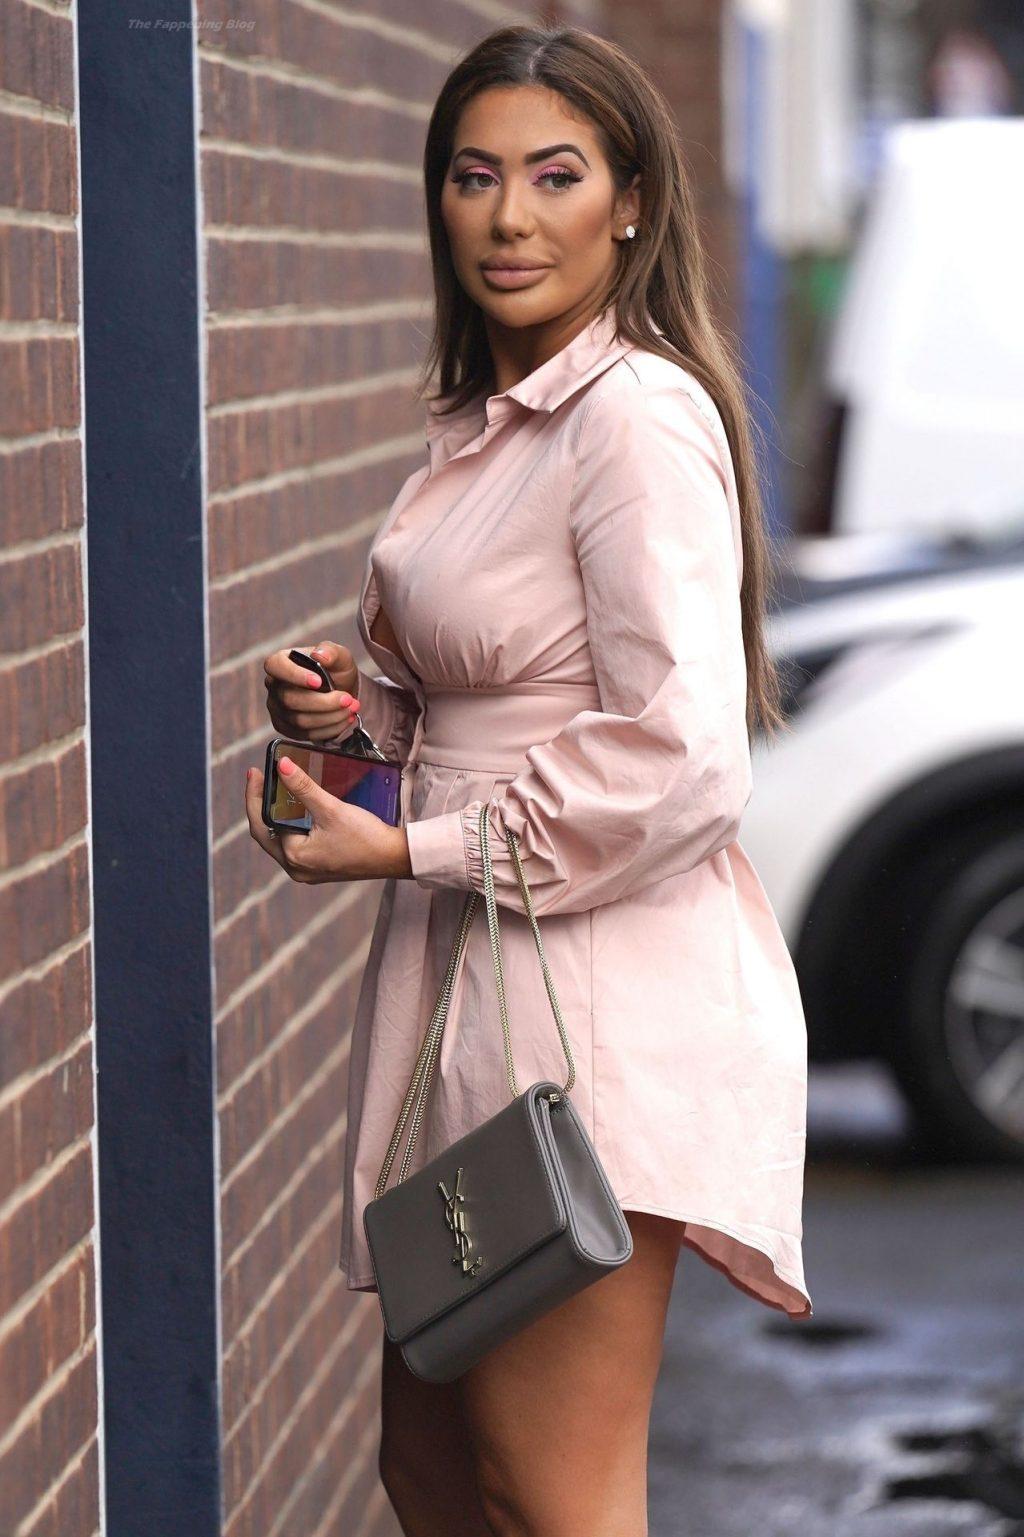 Chloe Ferry Sports Her Thigh-High Dress in Newcastle (34 Photos)